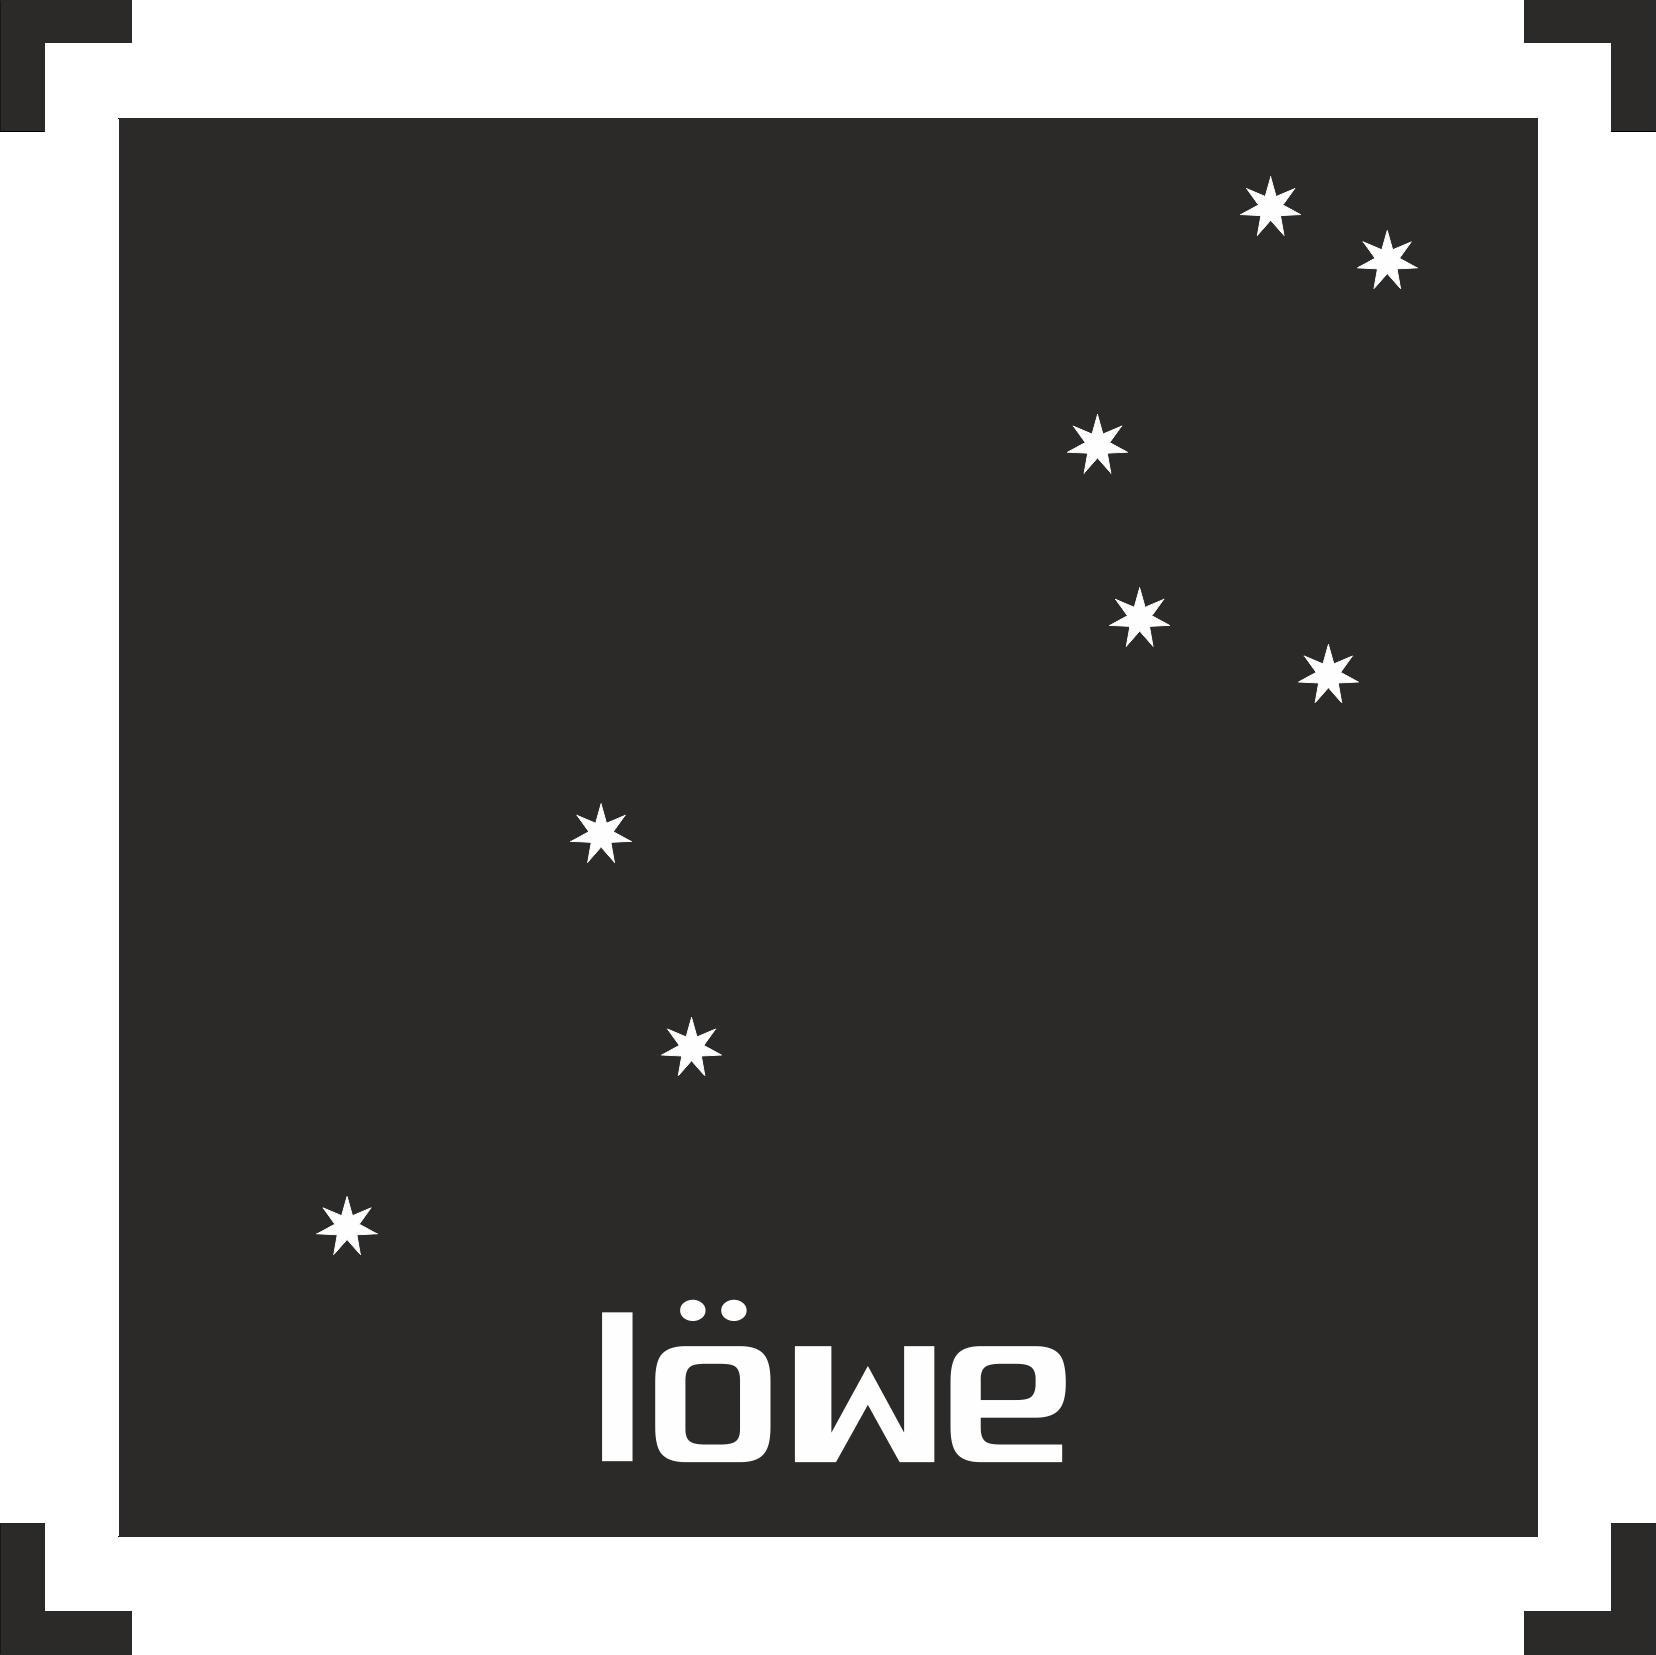 Löwe -003